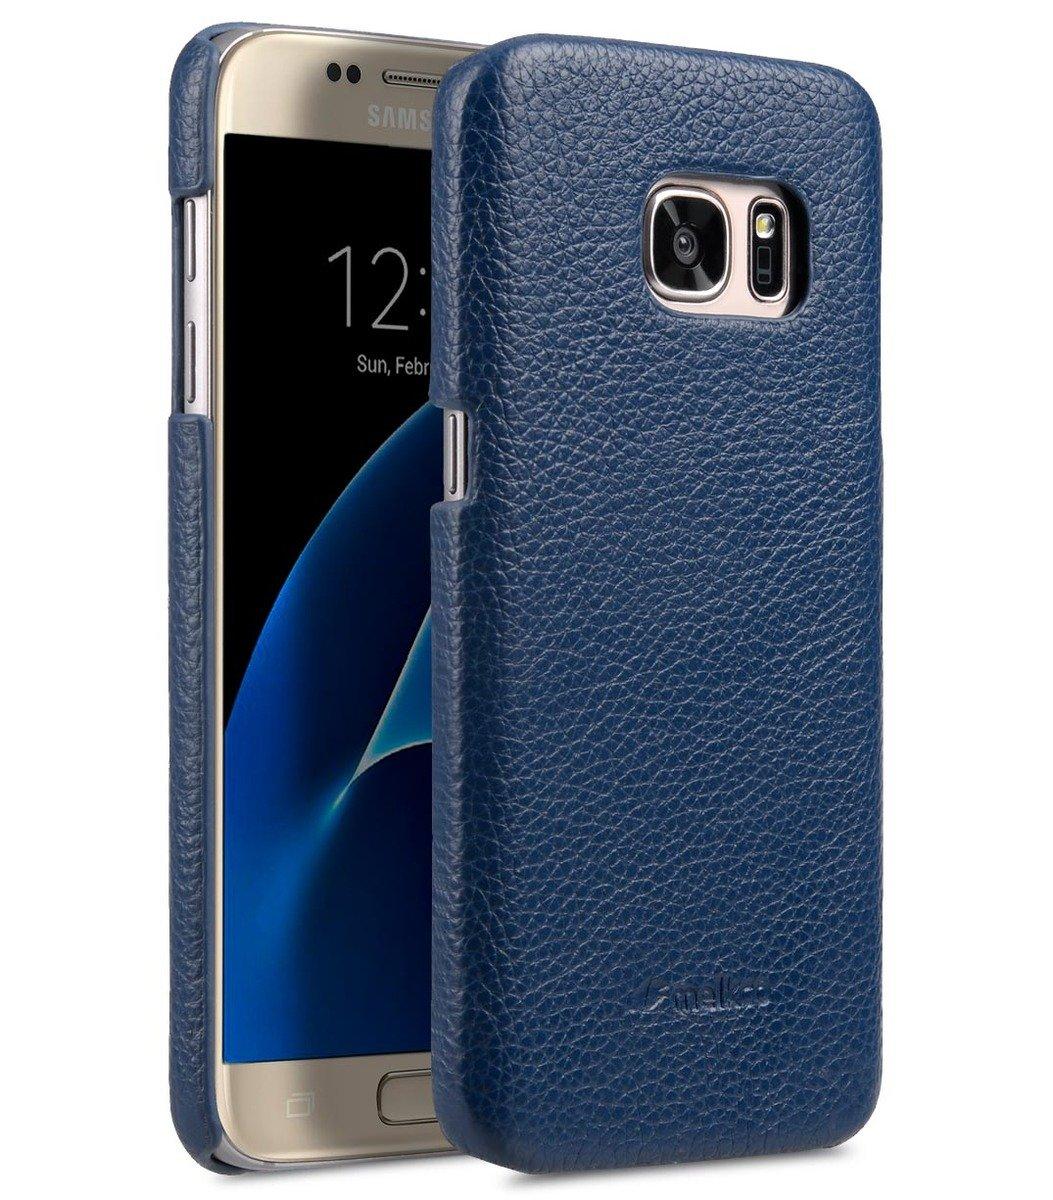 Samsung Galaxy S7 荔枝紋真皮背殼 (深藍色)